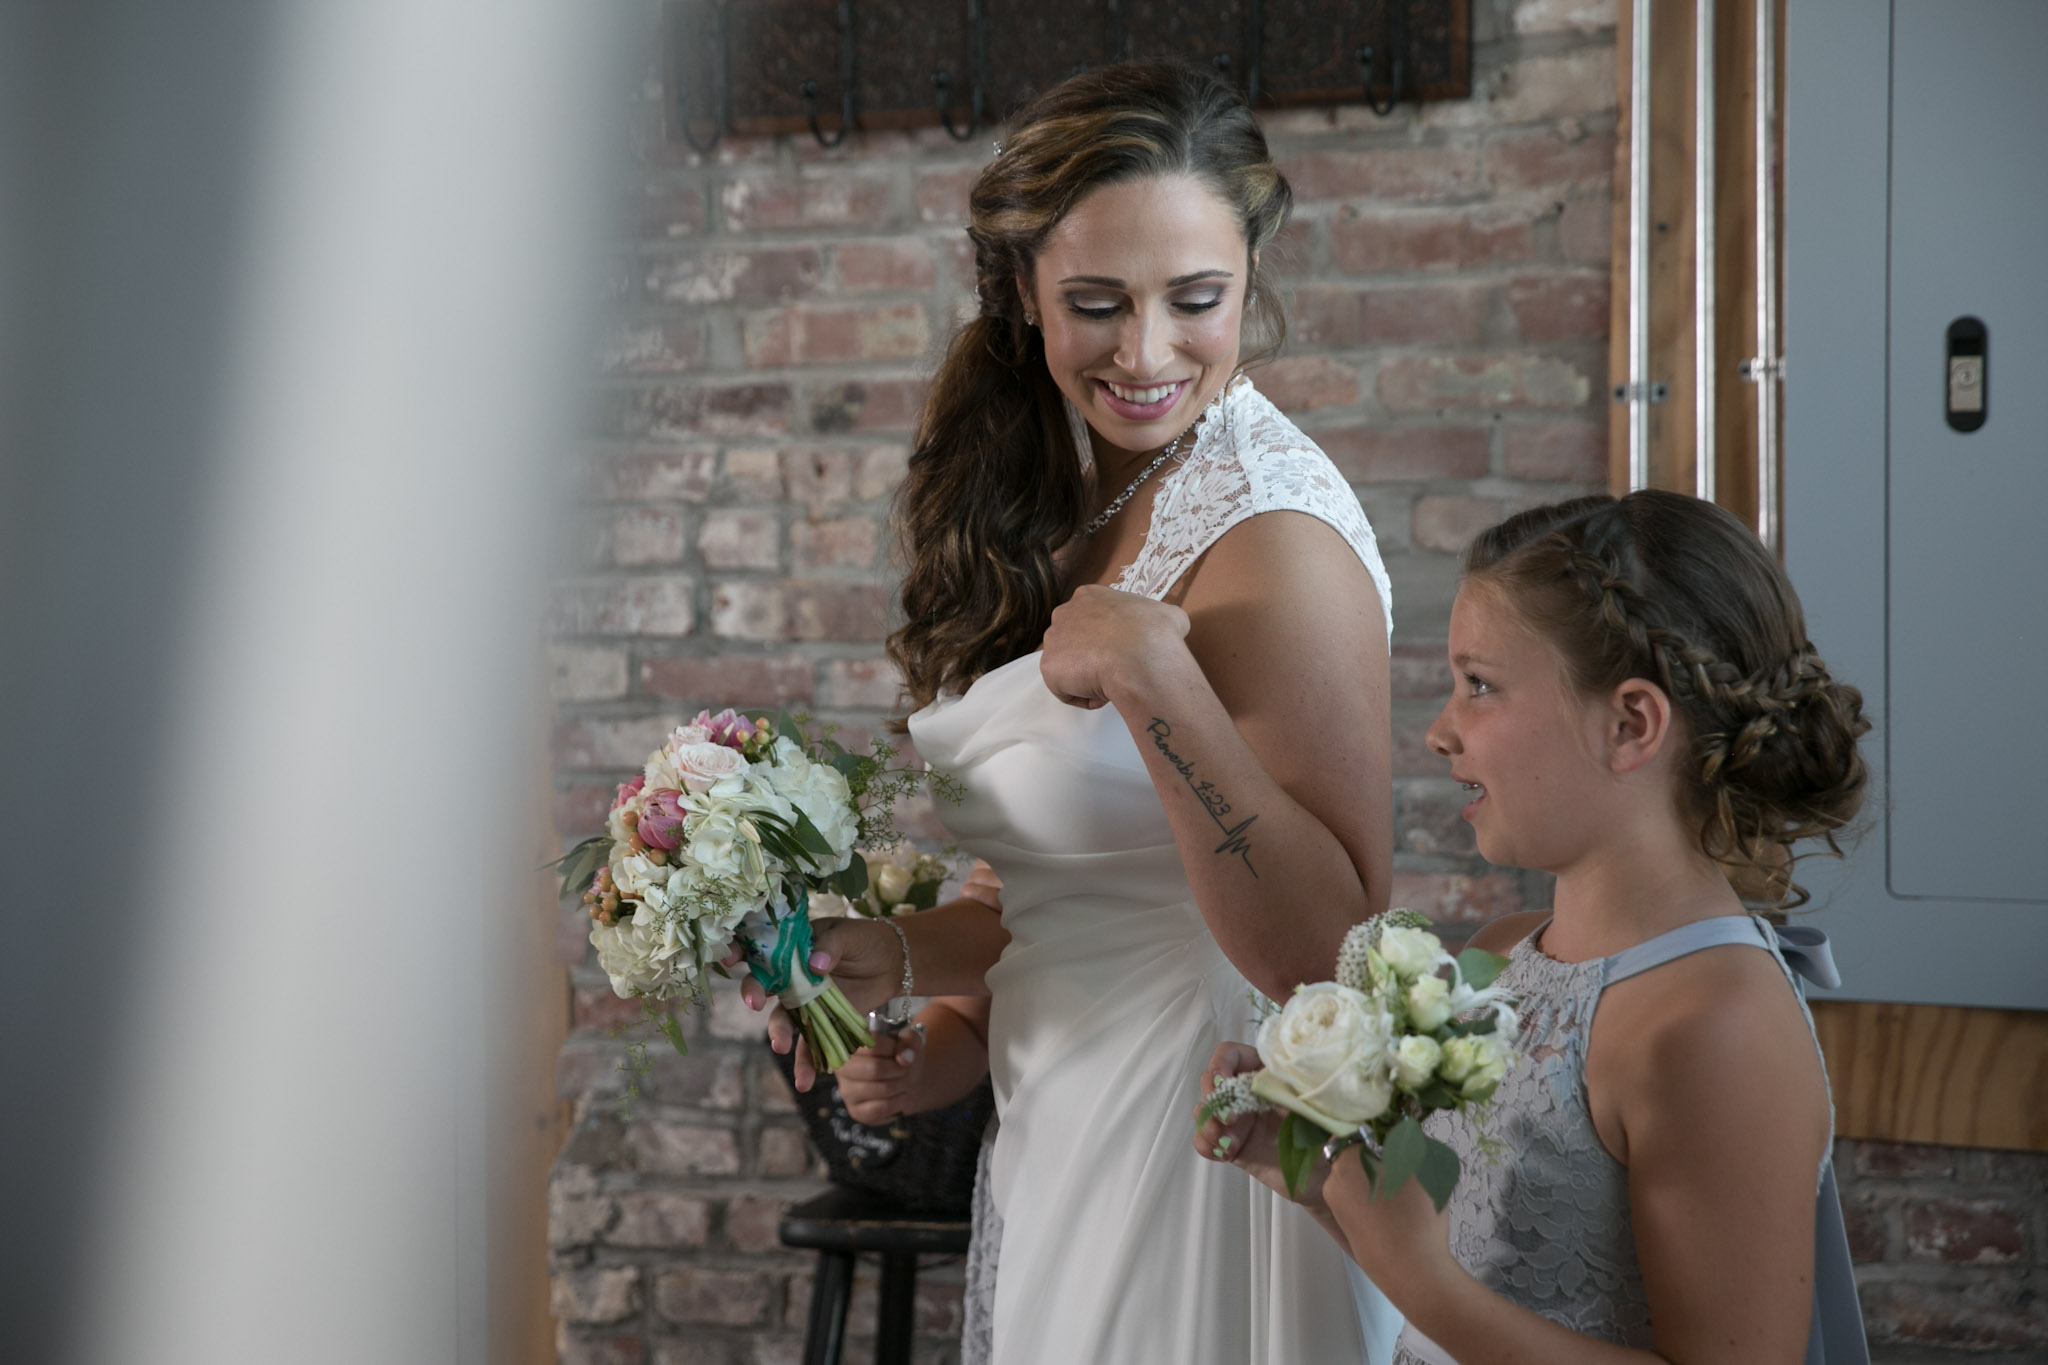 Kansas_City_Small_Wedding_Venue_Elope_Intimate_Ceremony_Budget_Affordable_155CJ.JPG